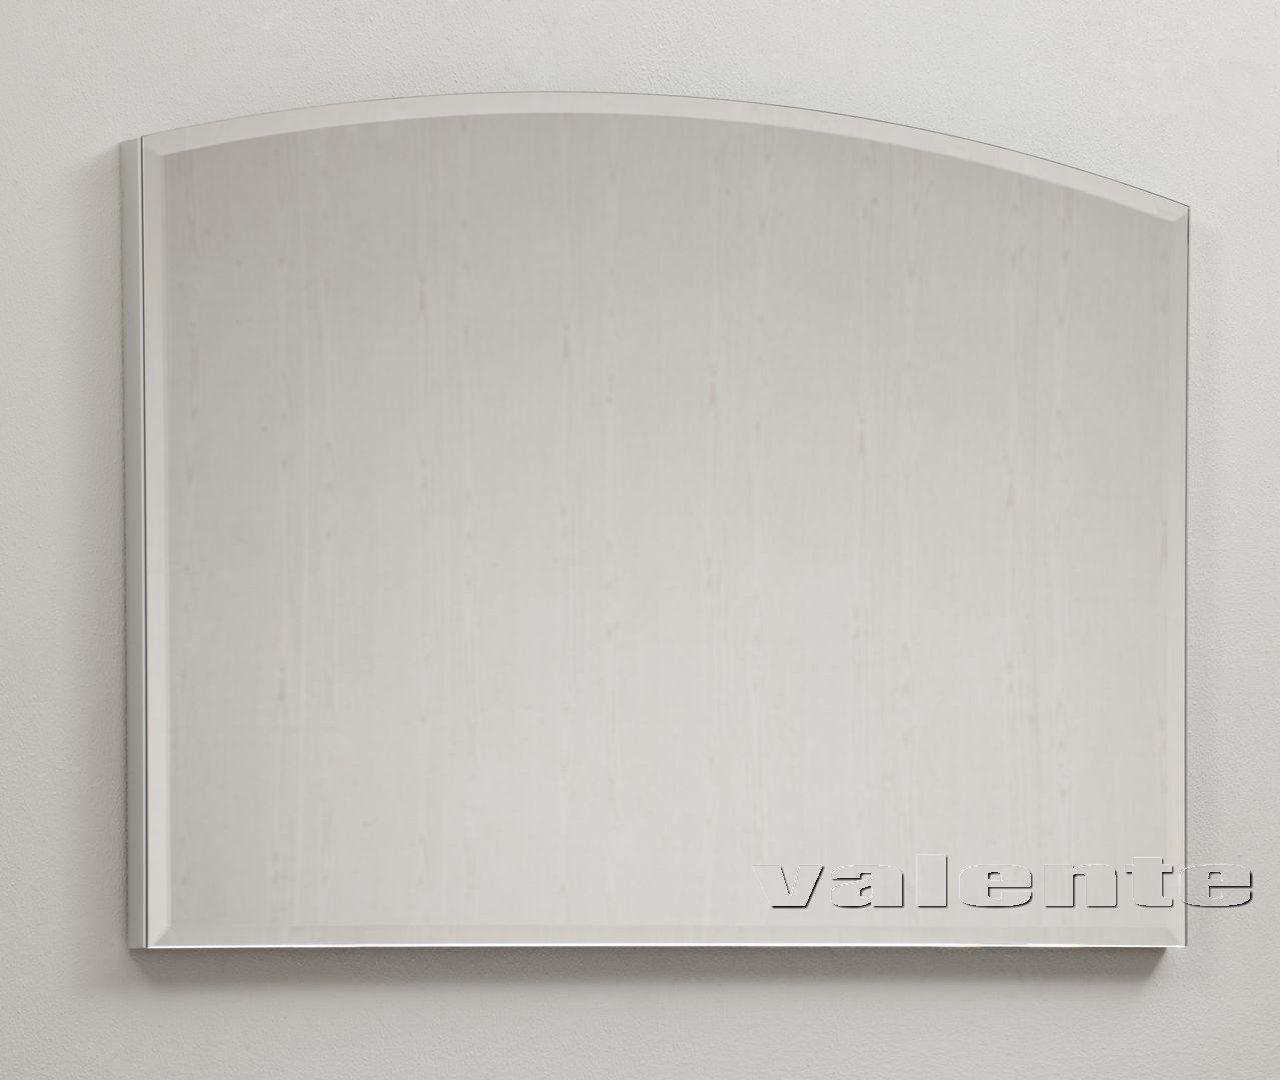 Зеркало в душевую кабину Severita S5 (Северита С5) 80х45 ФОТО